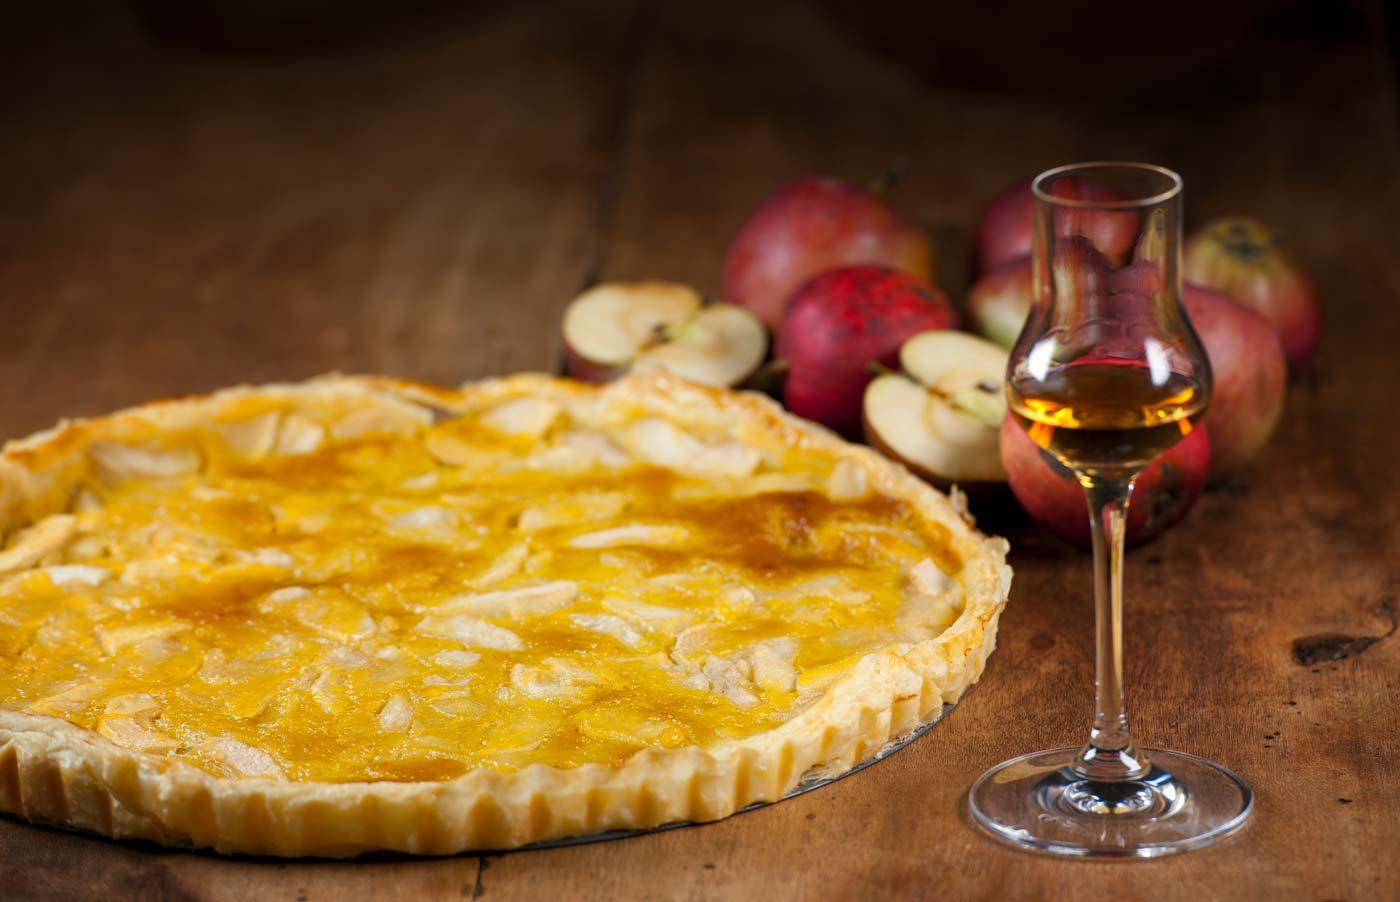 Norman apple pie